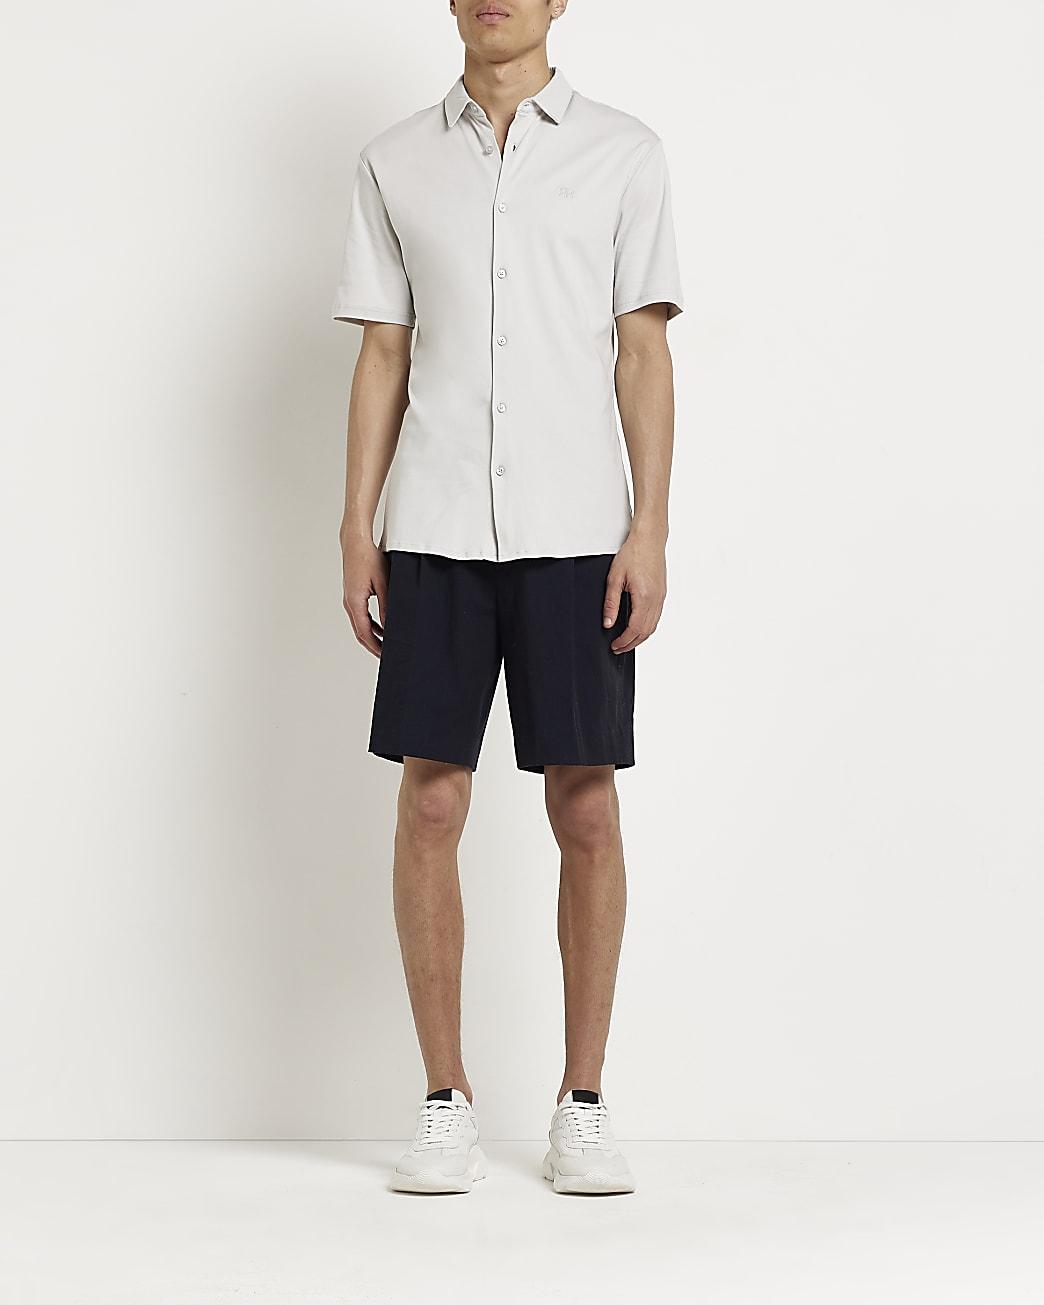 Grey marl RR muscle fit short sleeve shirt